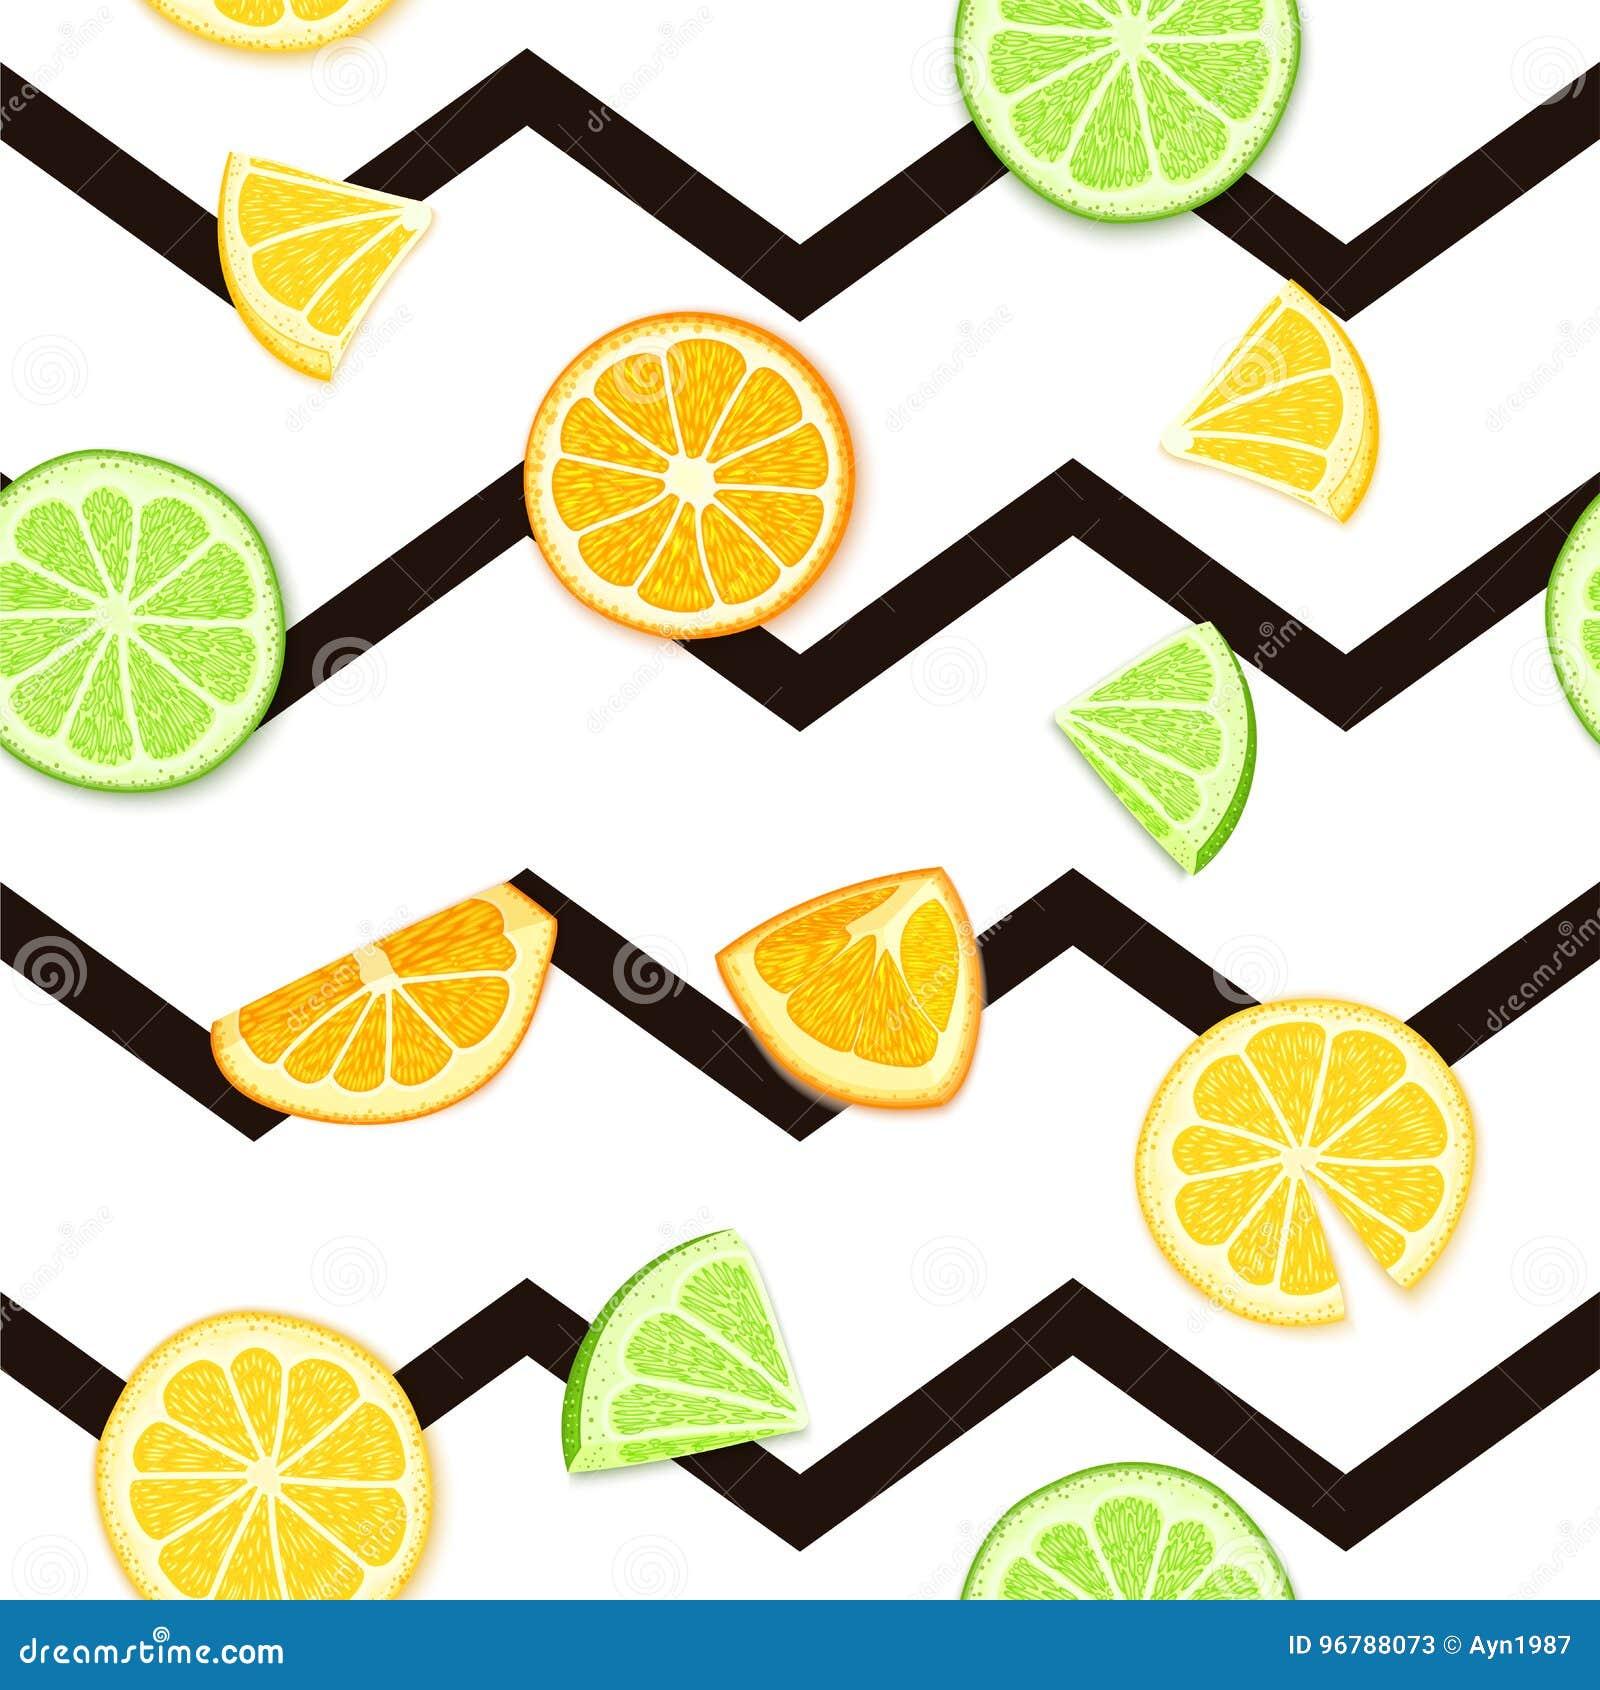 Ripe juicy tropical fruit striped seamless background. Vector card illustration. Fresh citrus lime orange lemon fruit on